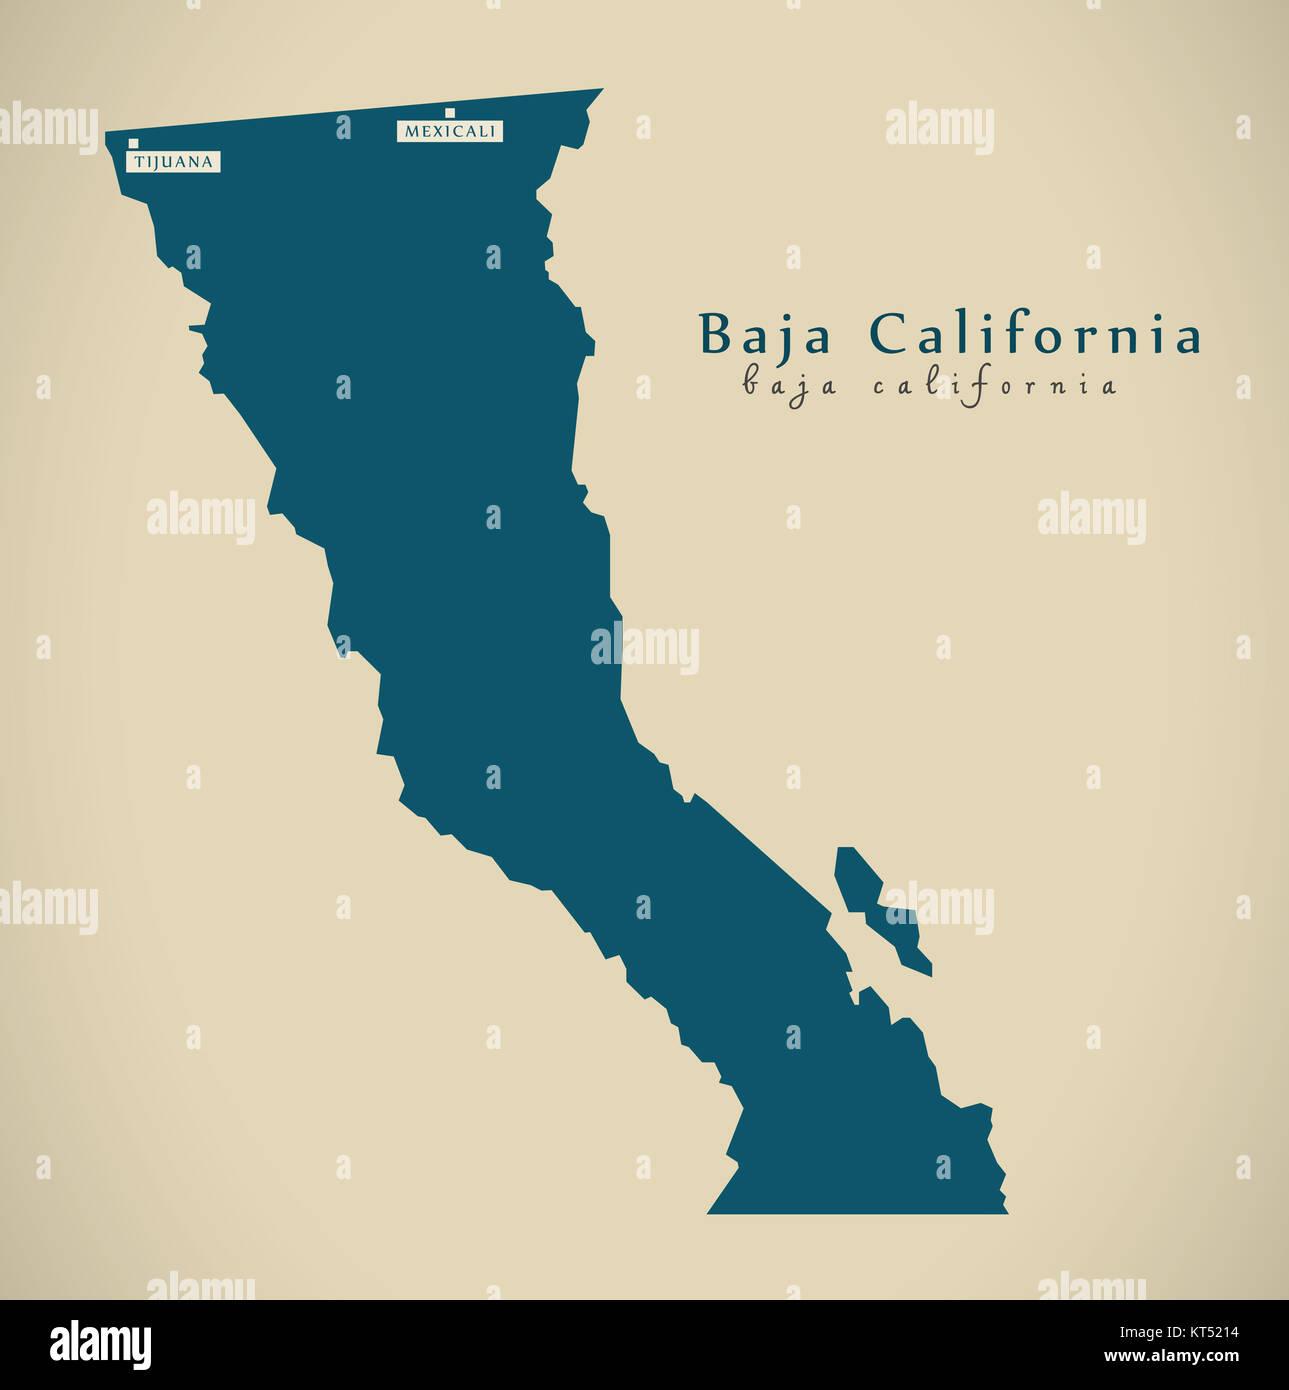 Baja California Map Mexico.Modern Map Baja California Mexico Mx Illustration Stock Photo